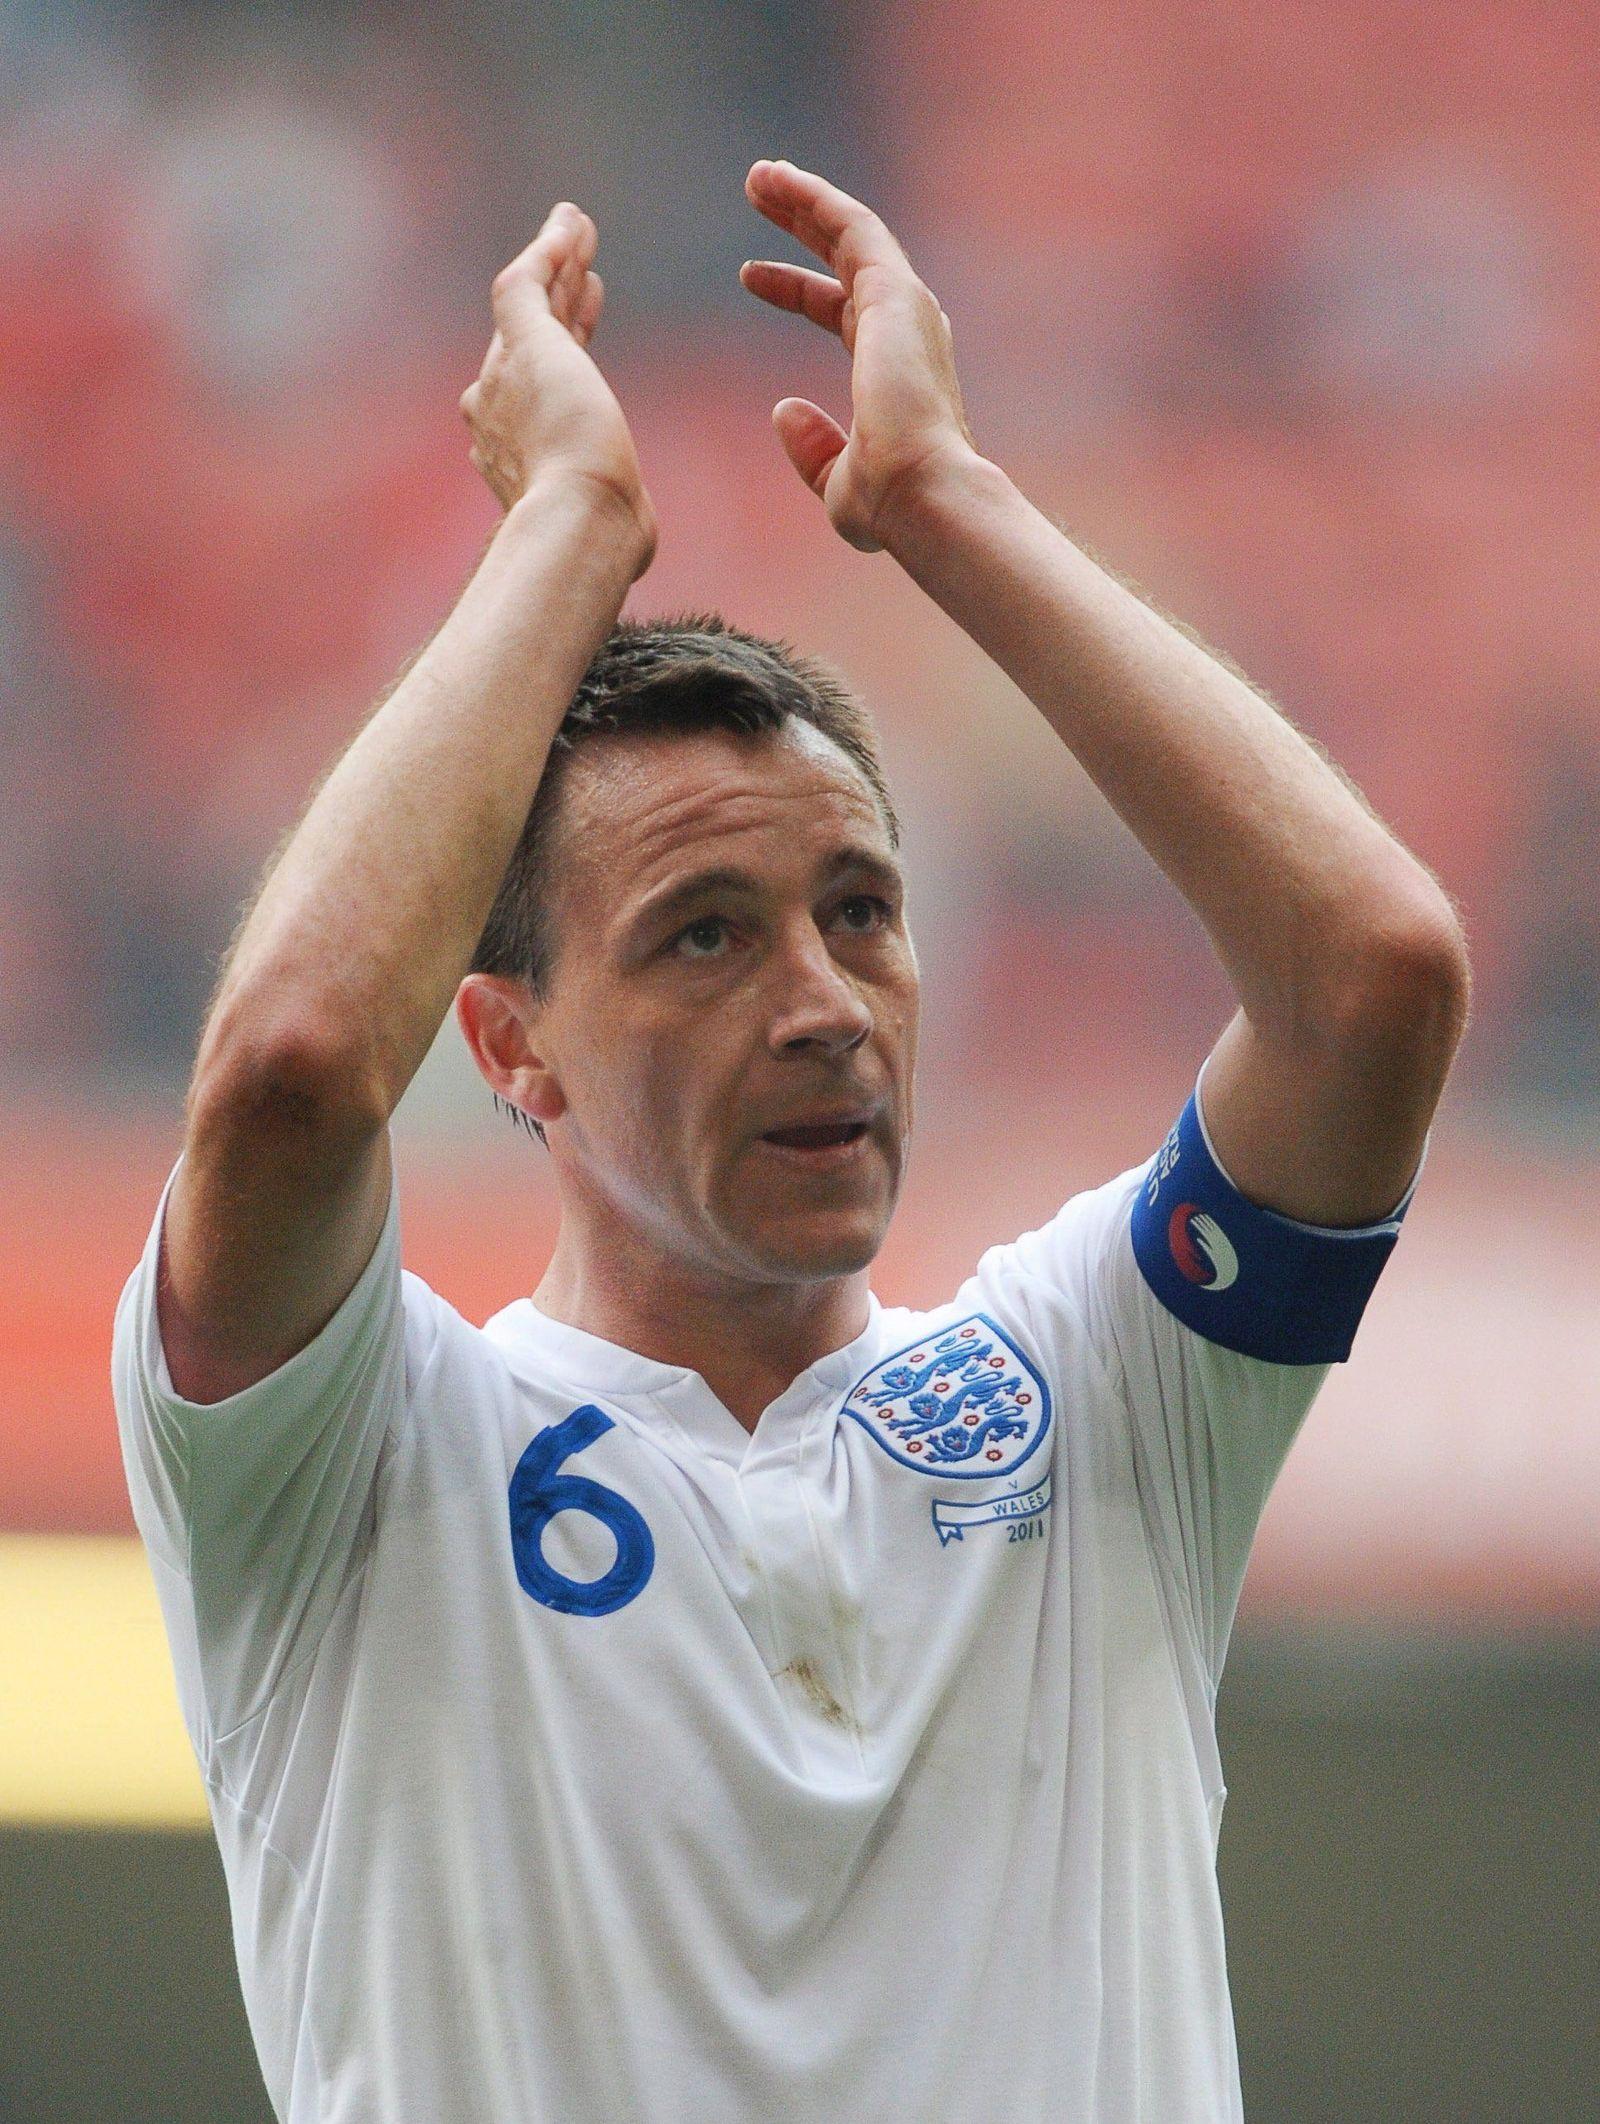 English Football Association is set to strip the England captainc